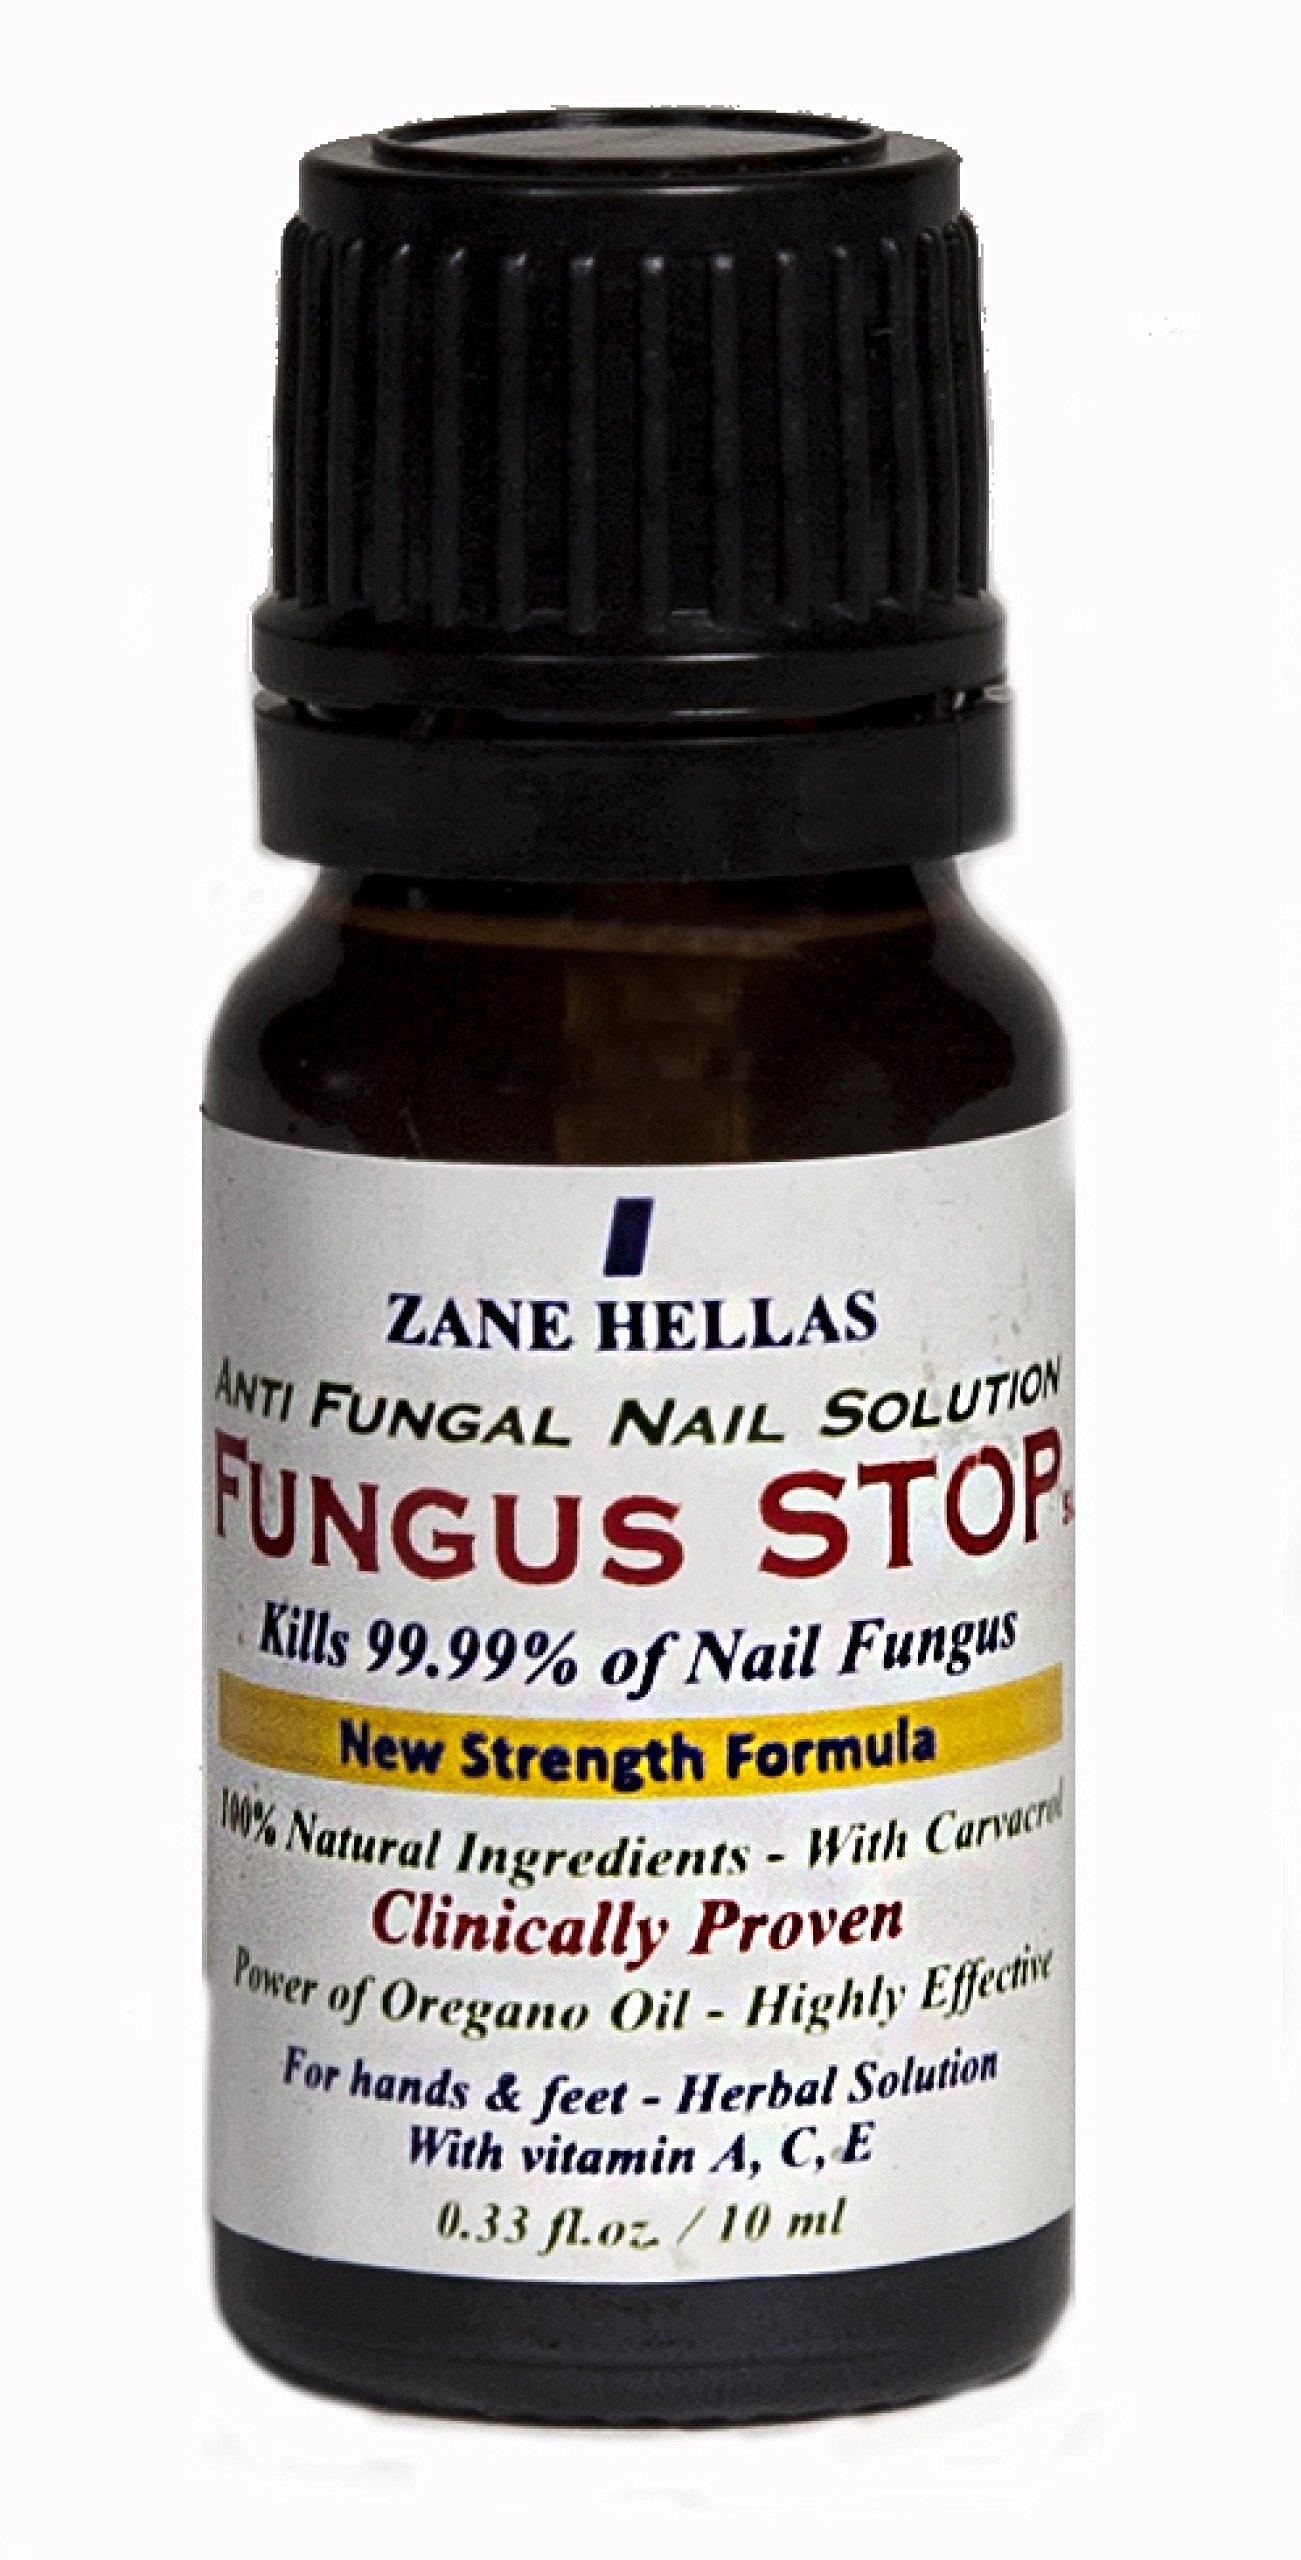 Fungus Stop